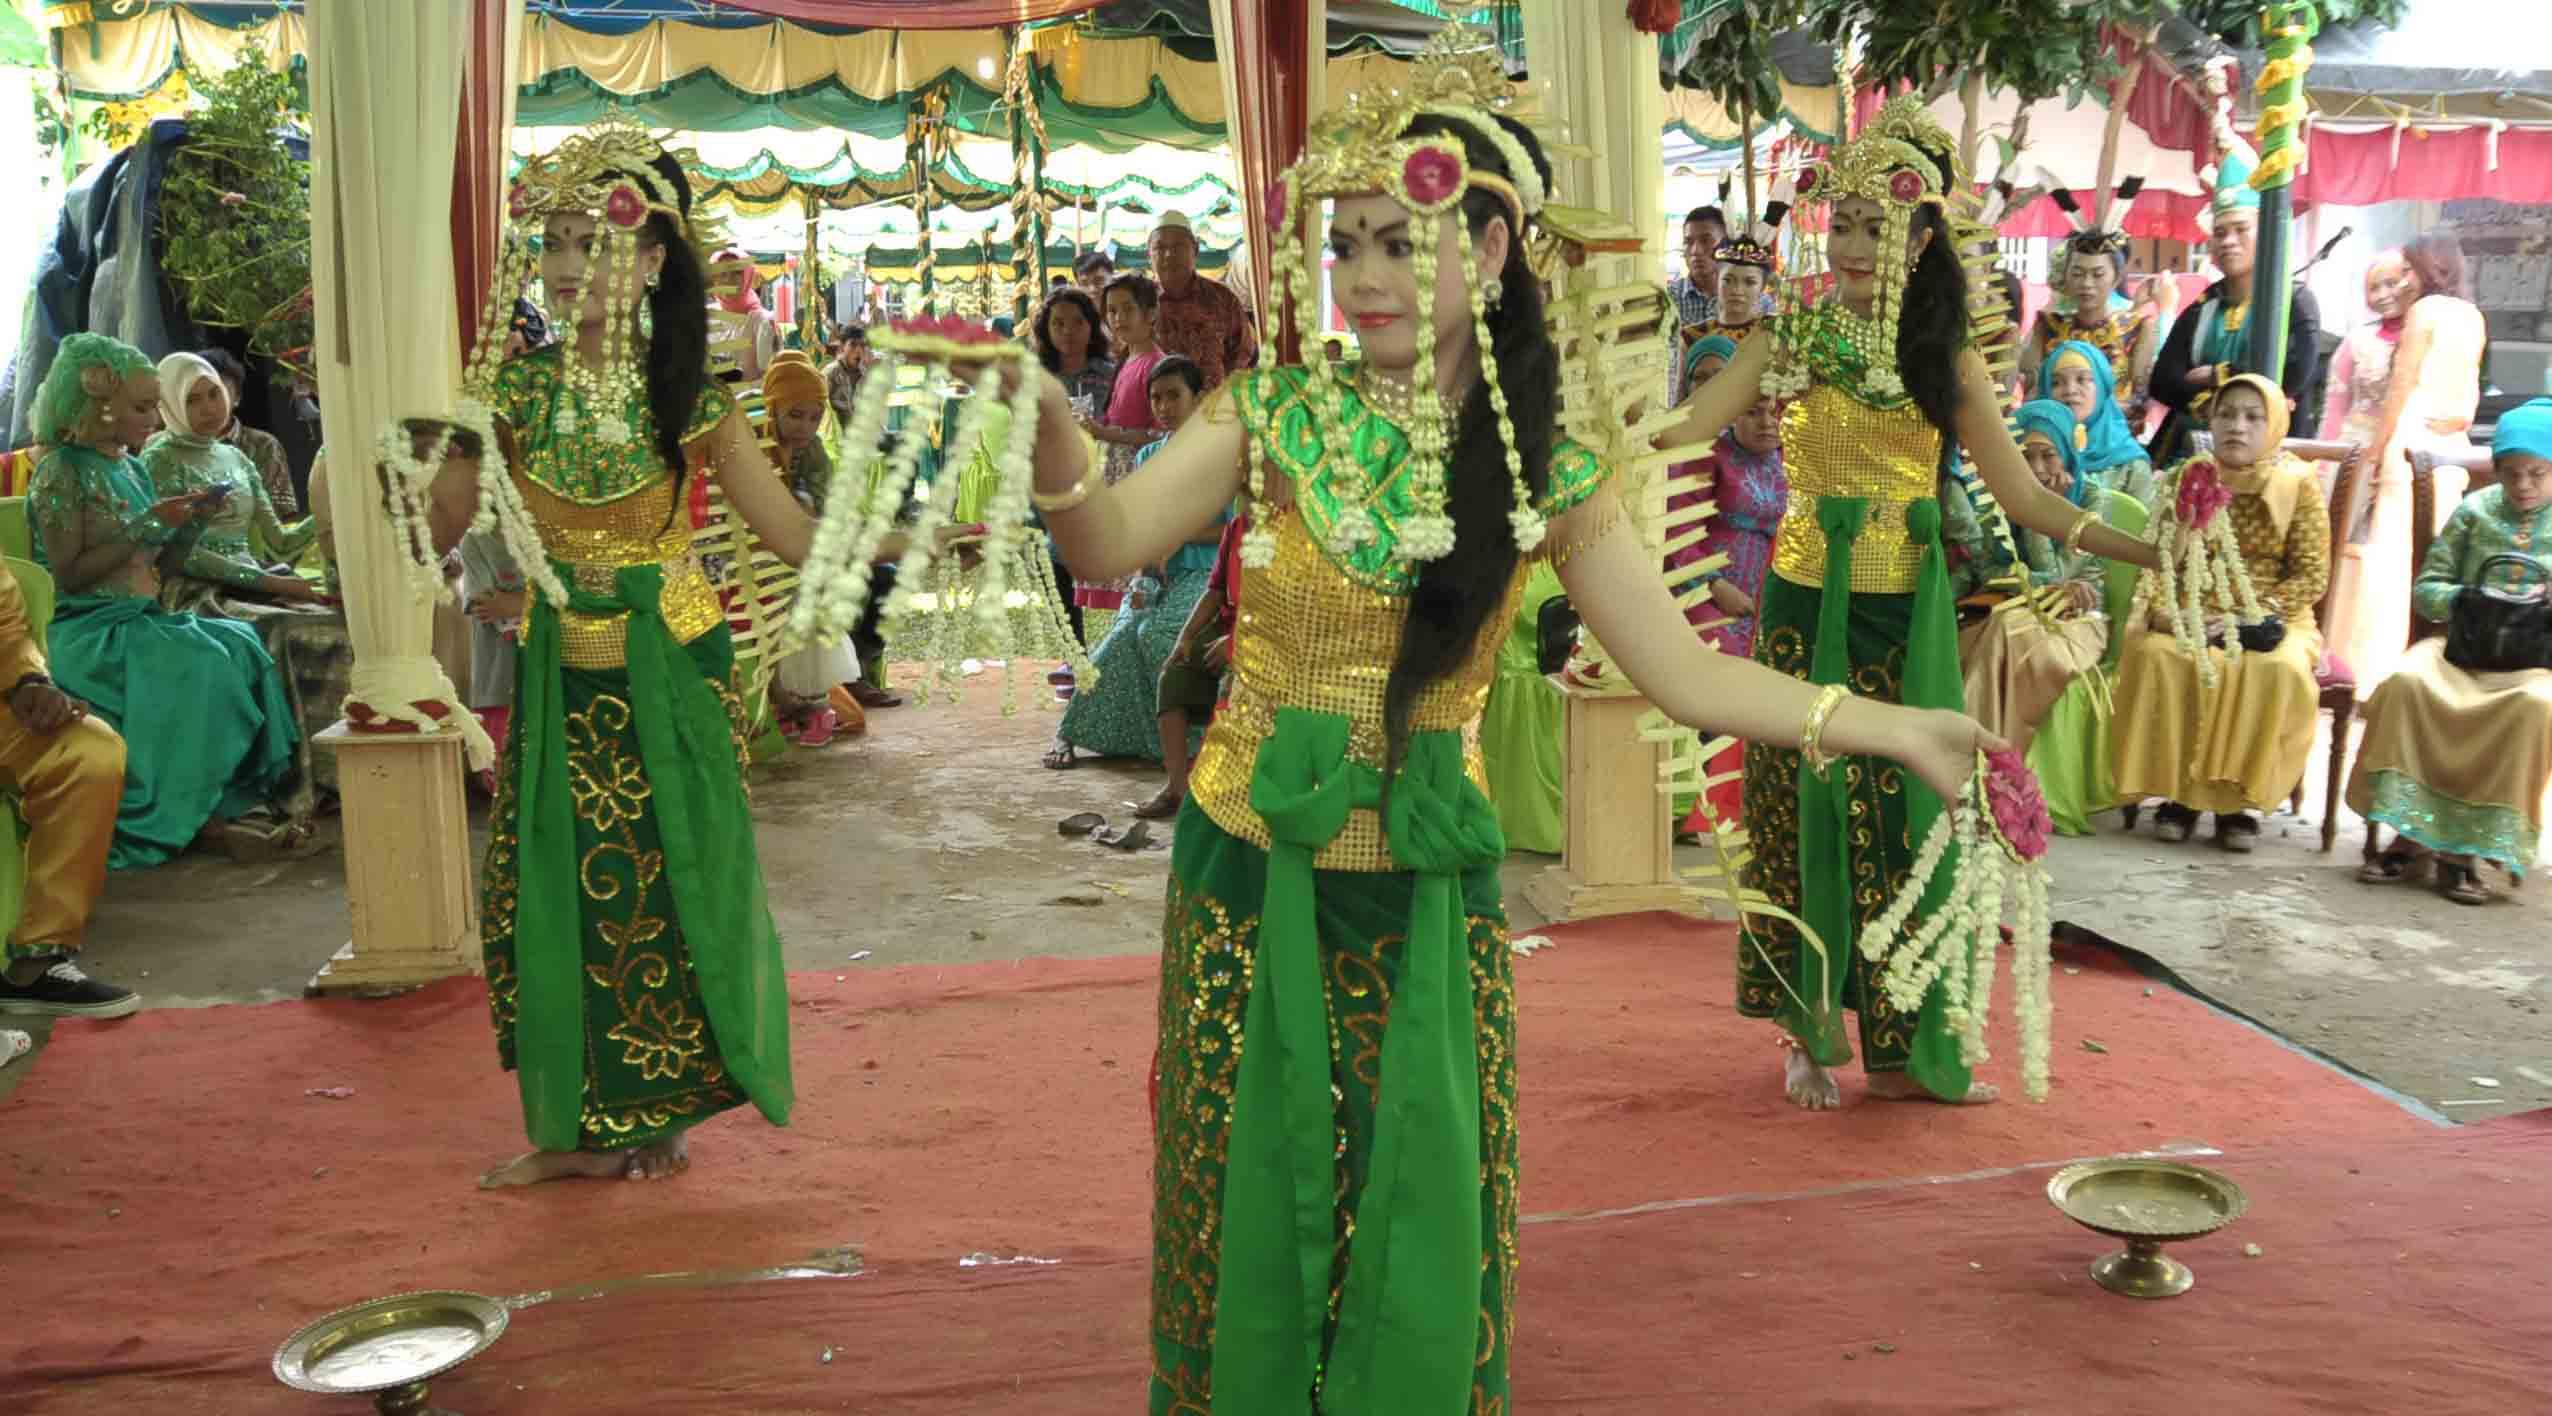 Tarian Tradisional Kalimantan Selatan Penjelasannya Azamku Baksa Kambang Taman Budaya